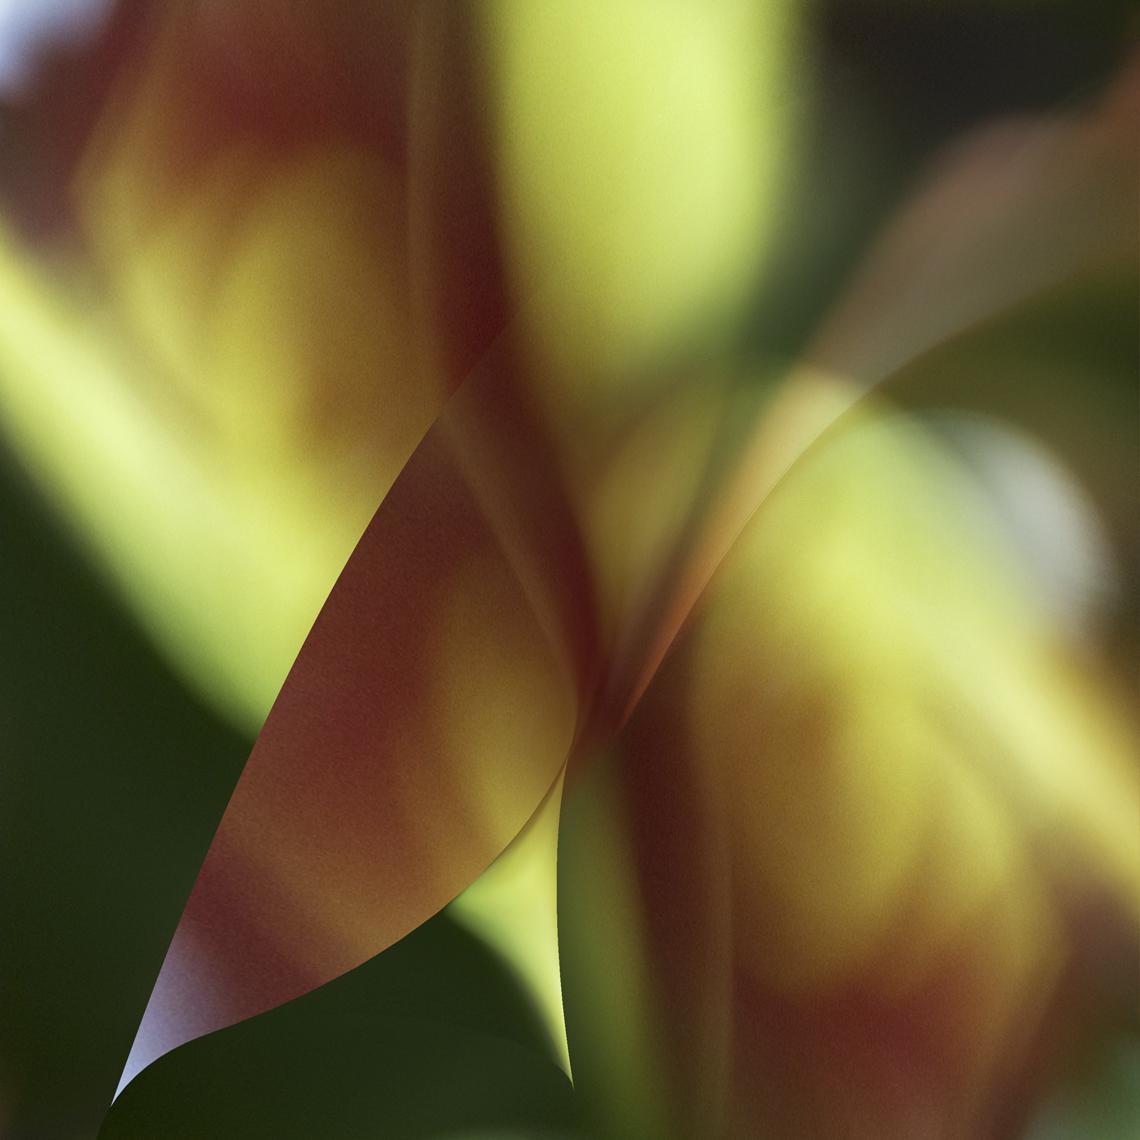 05-Maui-9.jpg